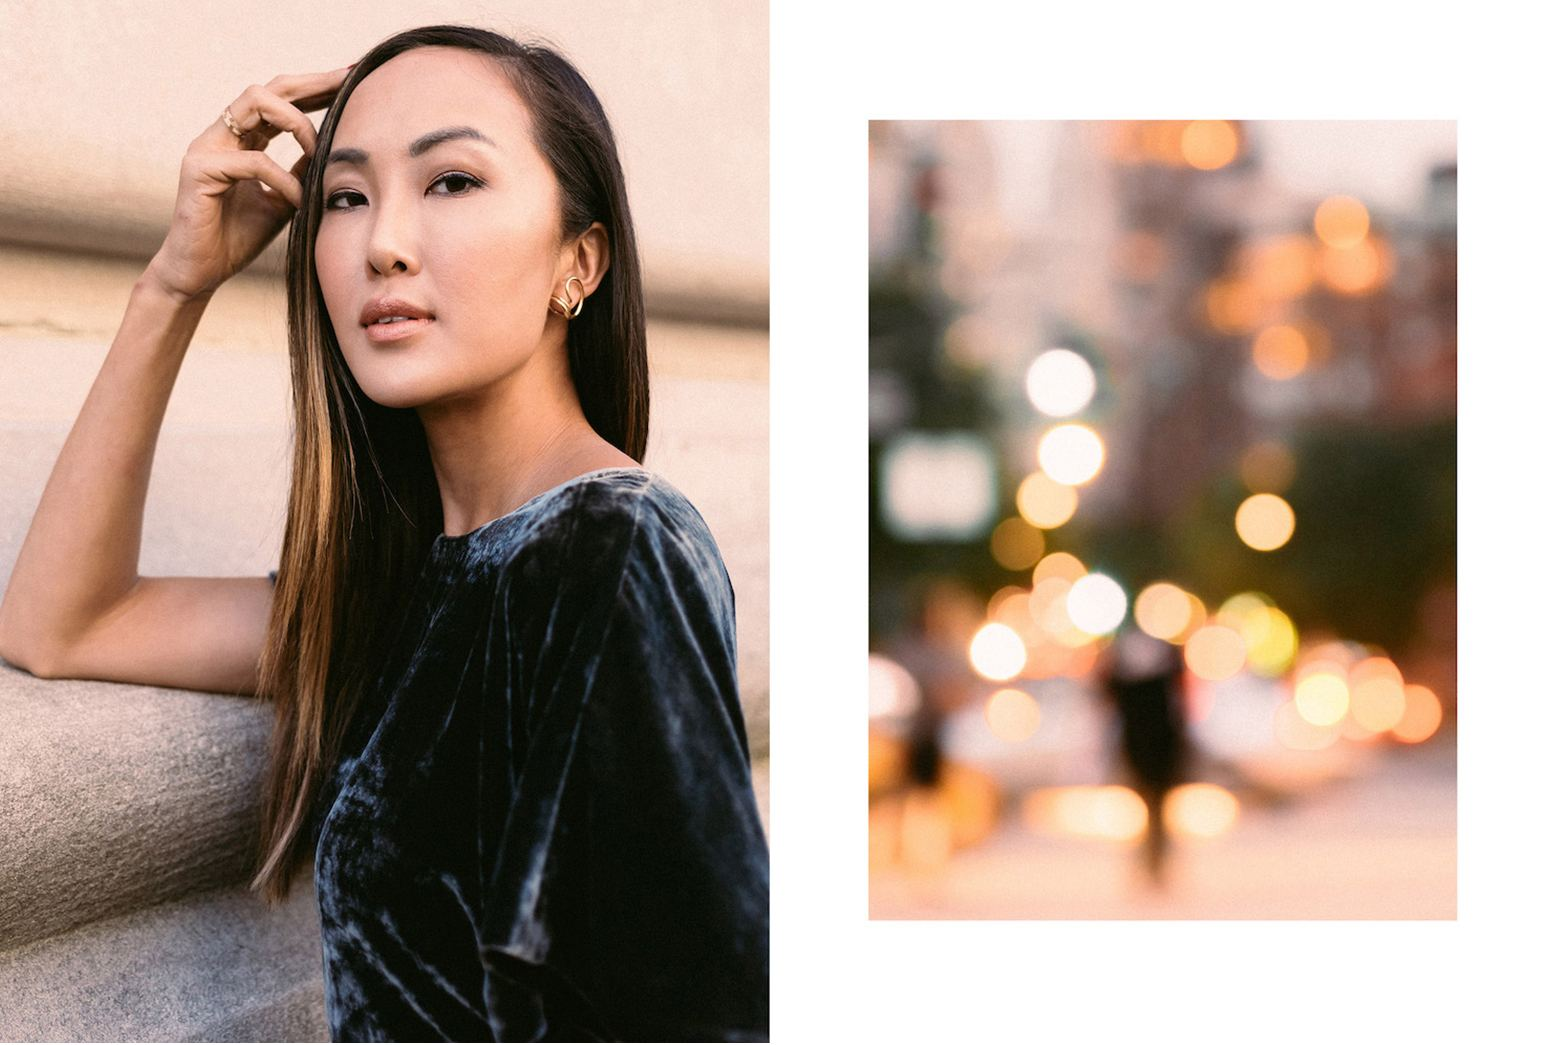 Chriselle Lim dressed in a velvet top